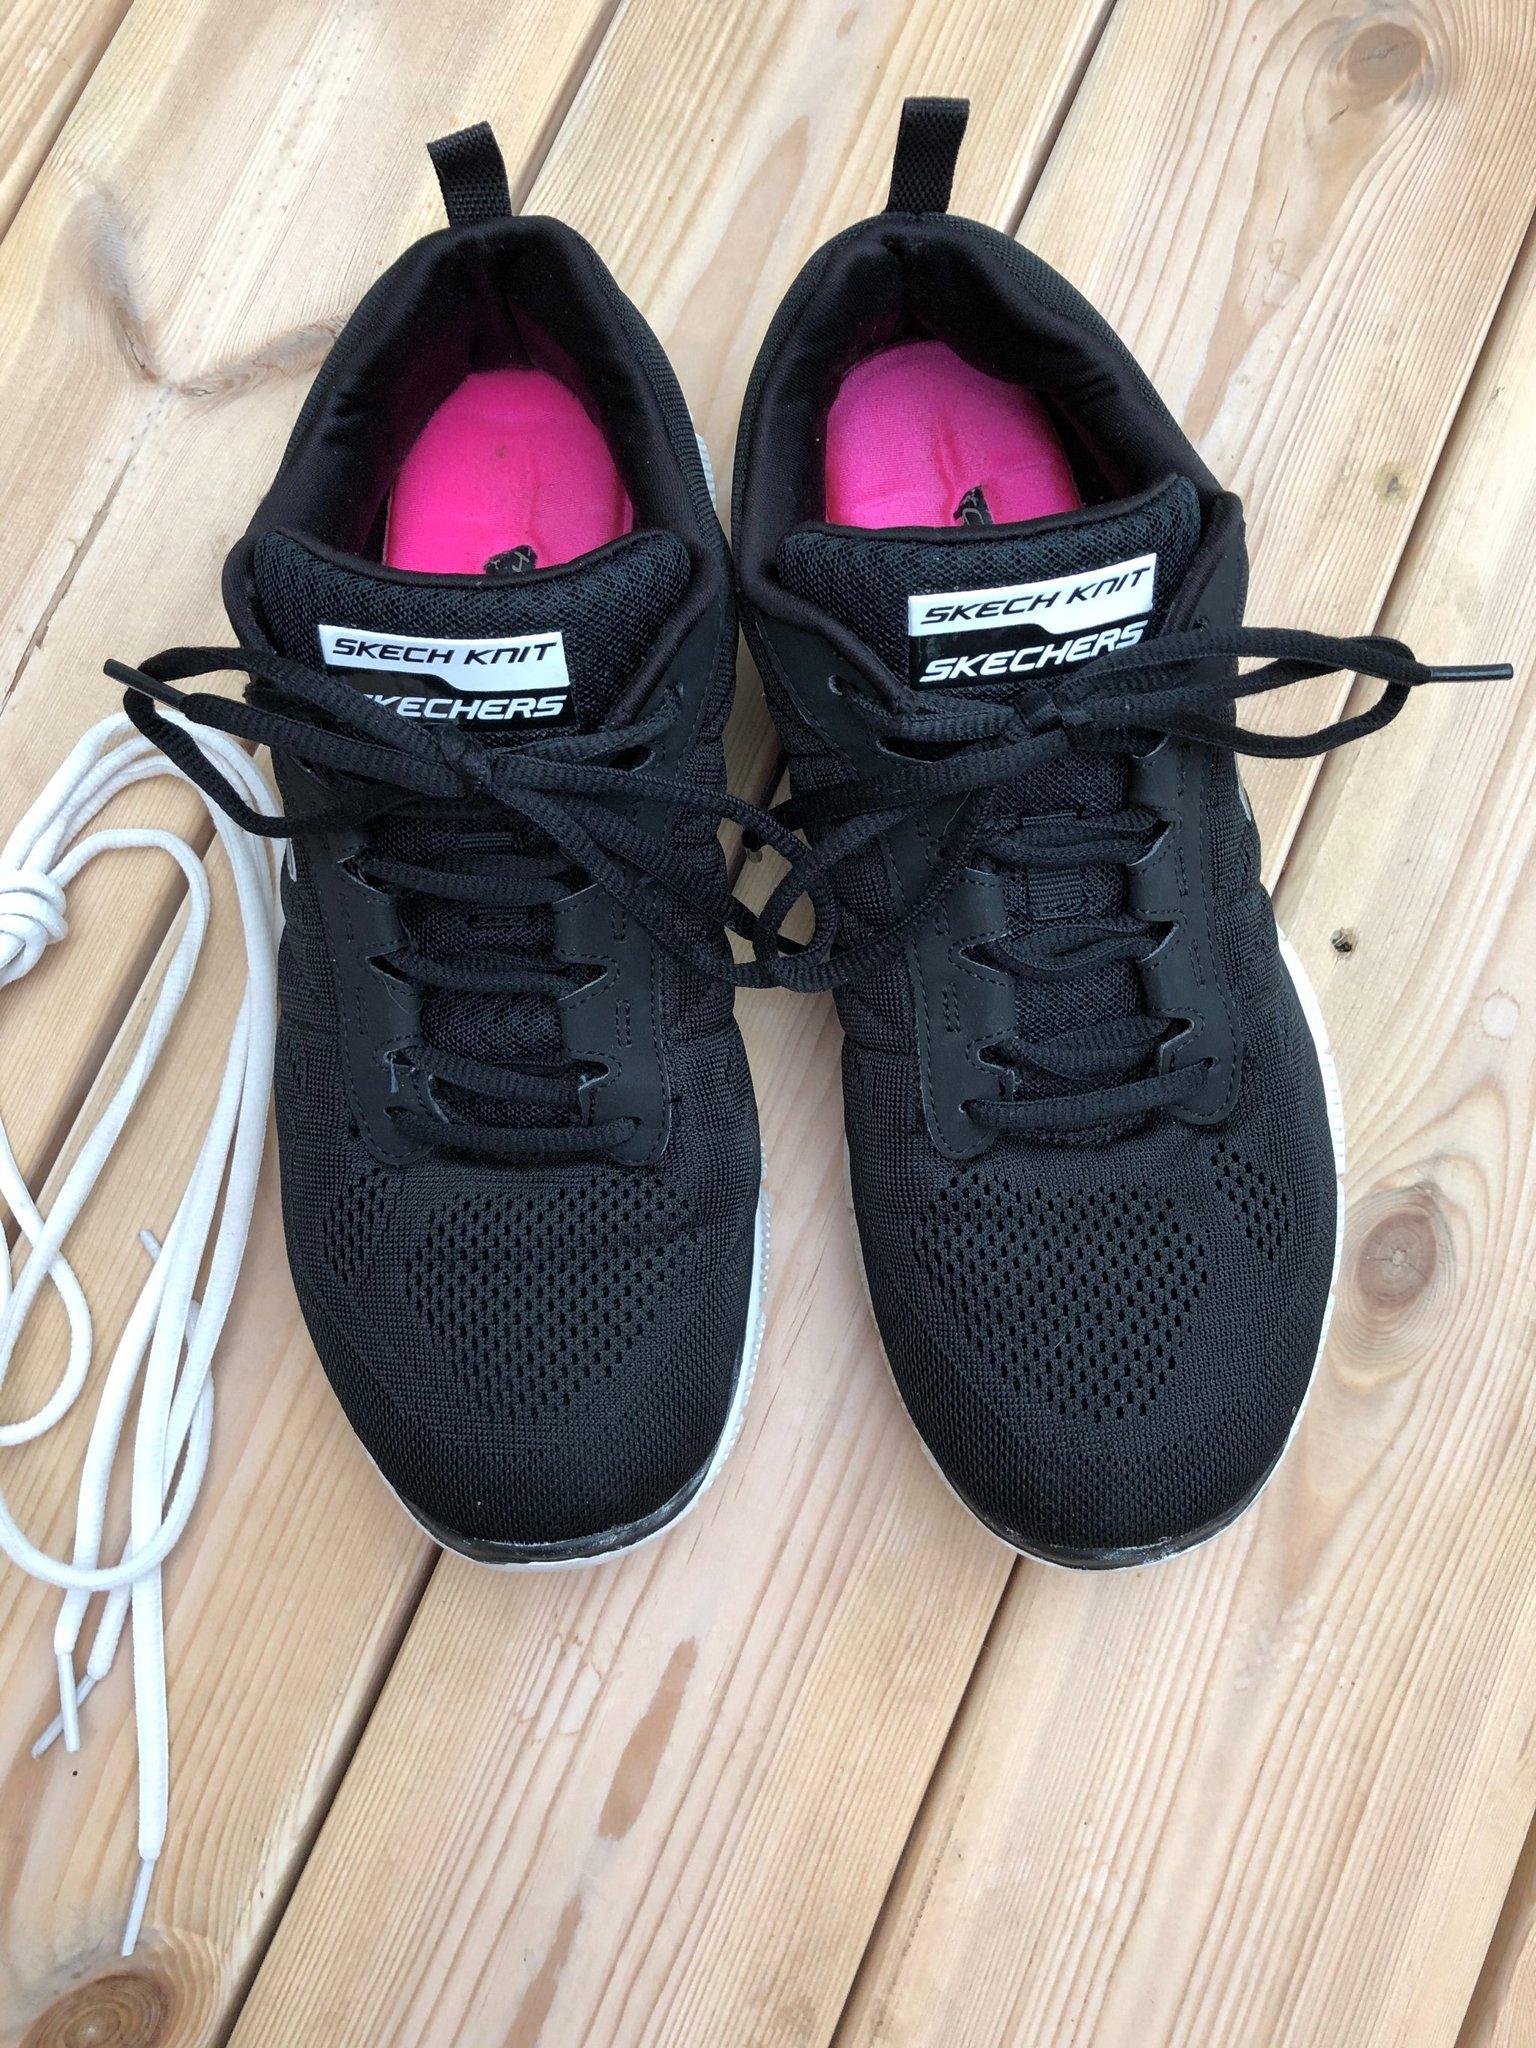 Gasformig Bekräftelse Monark  Skechers skor i storlek 40 skor online | FOOTWAY | Skor